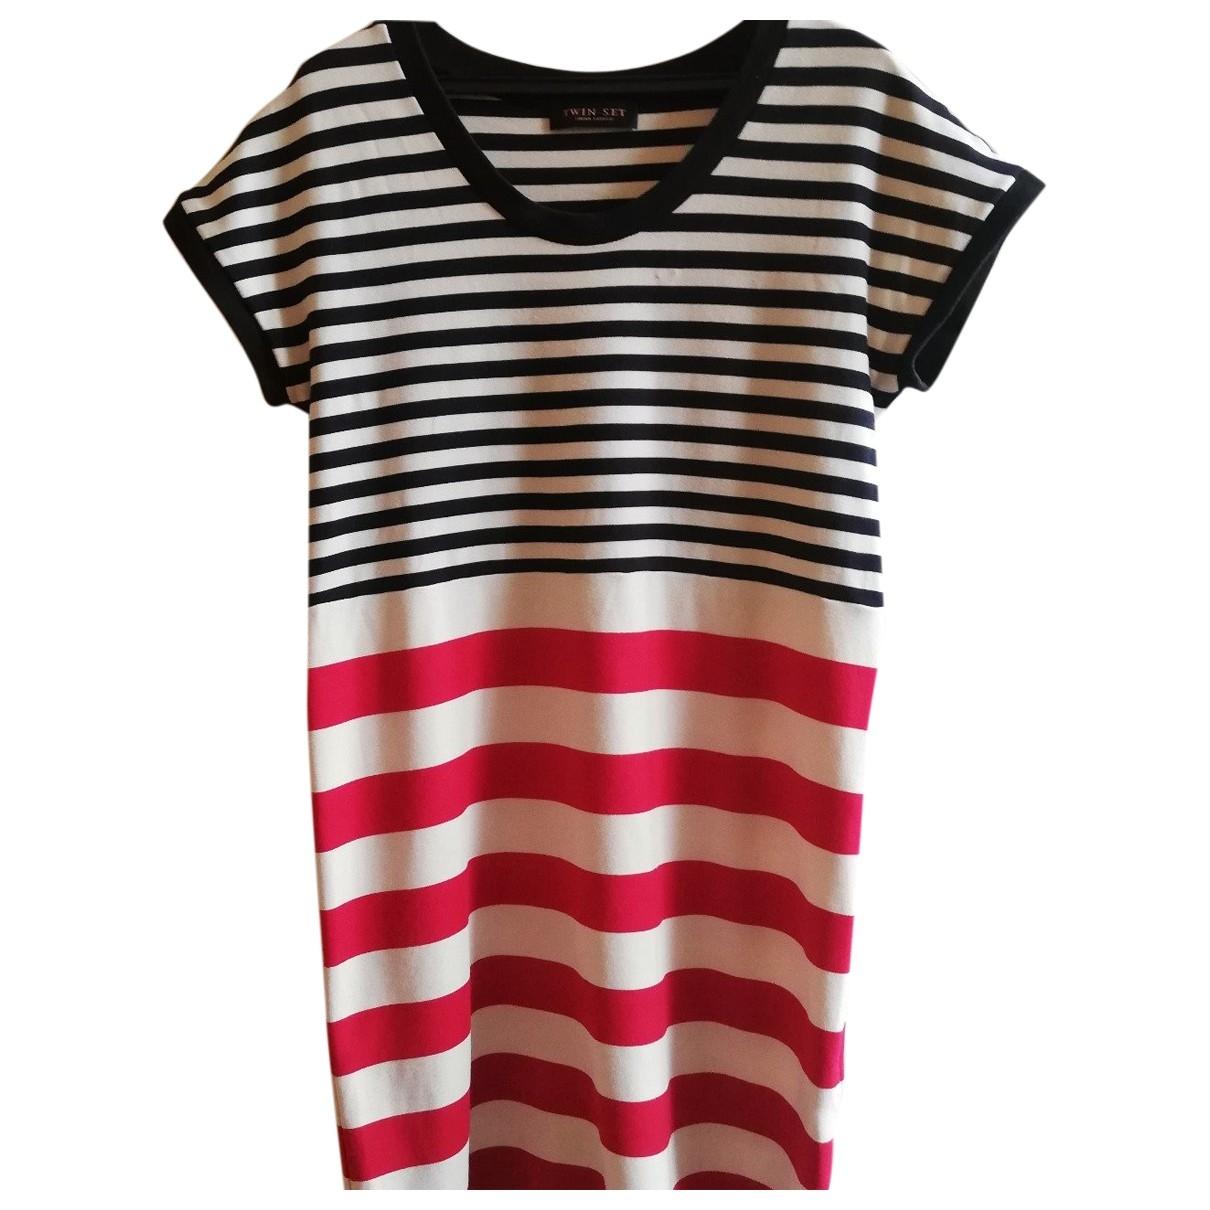 Twin Set \N Cotton - elasthane dress for Women 38 IT